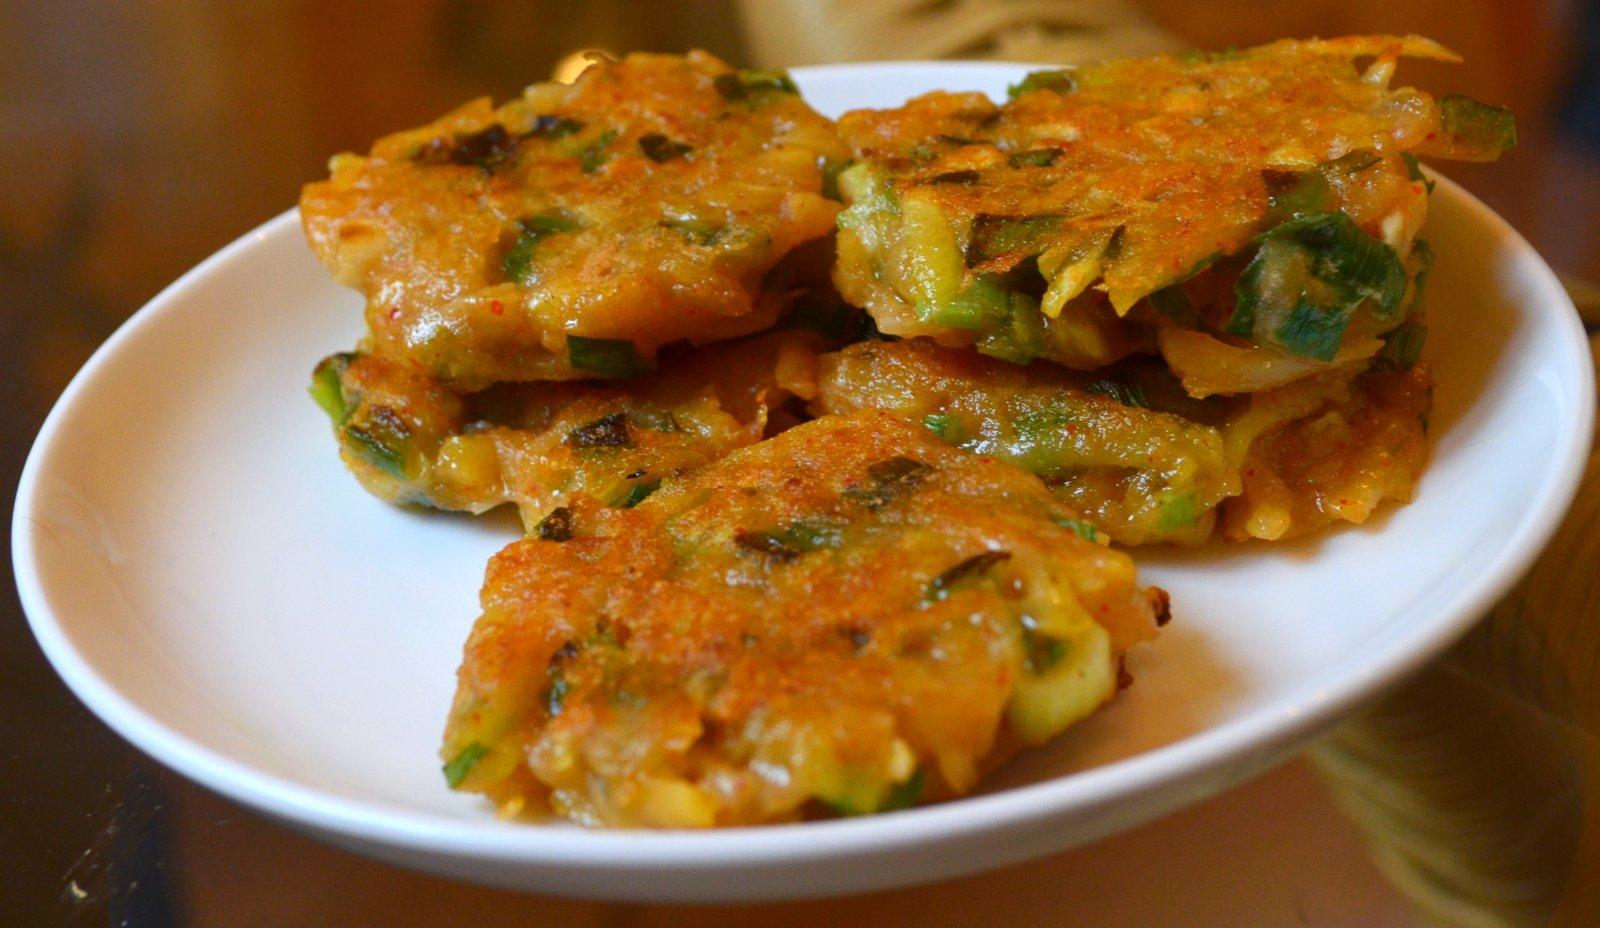 Instant baked aloo tikki recipe by archanas kitchen instant baked aloo tikki recipe forumfinder Gallery